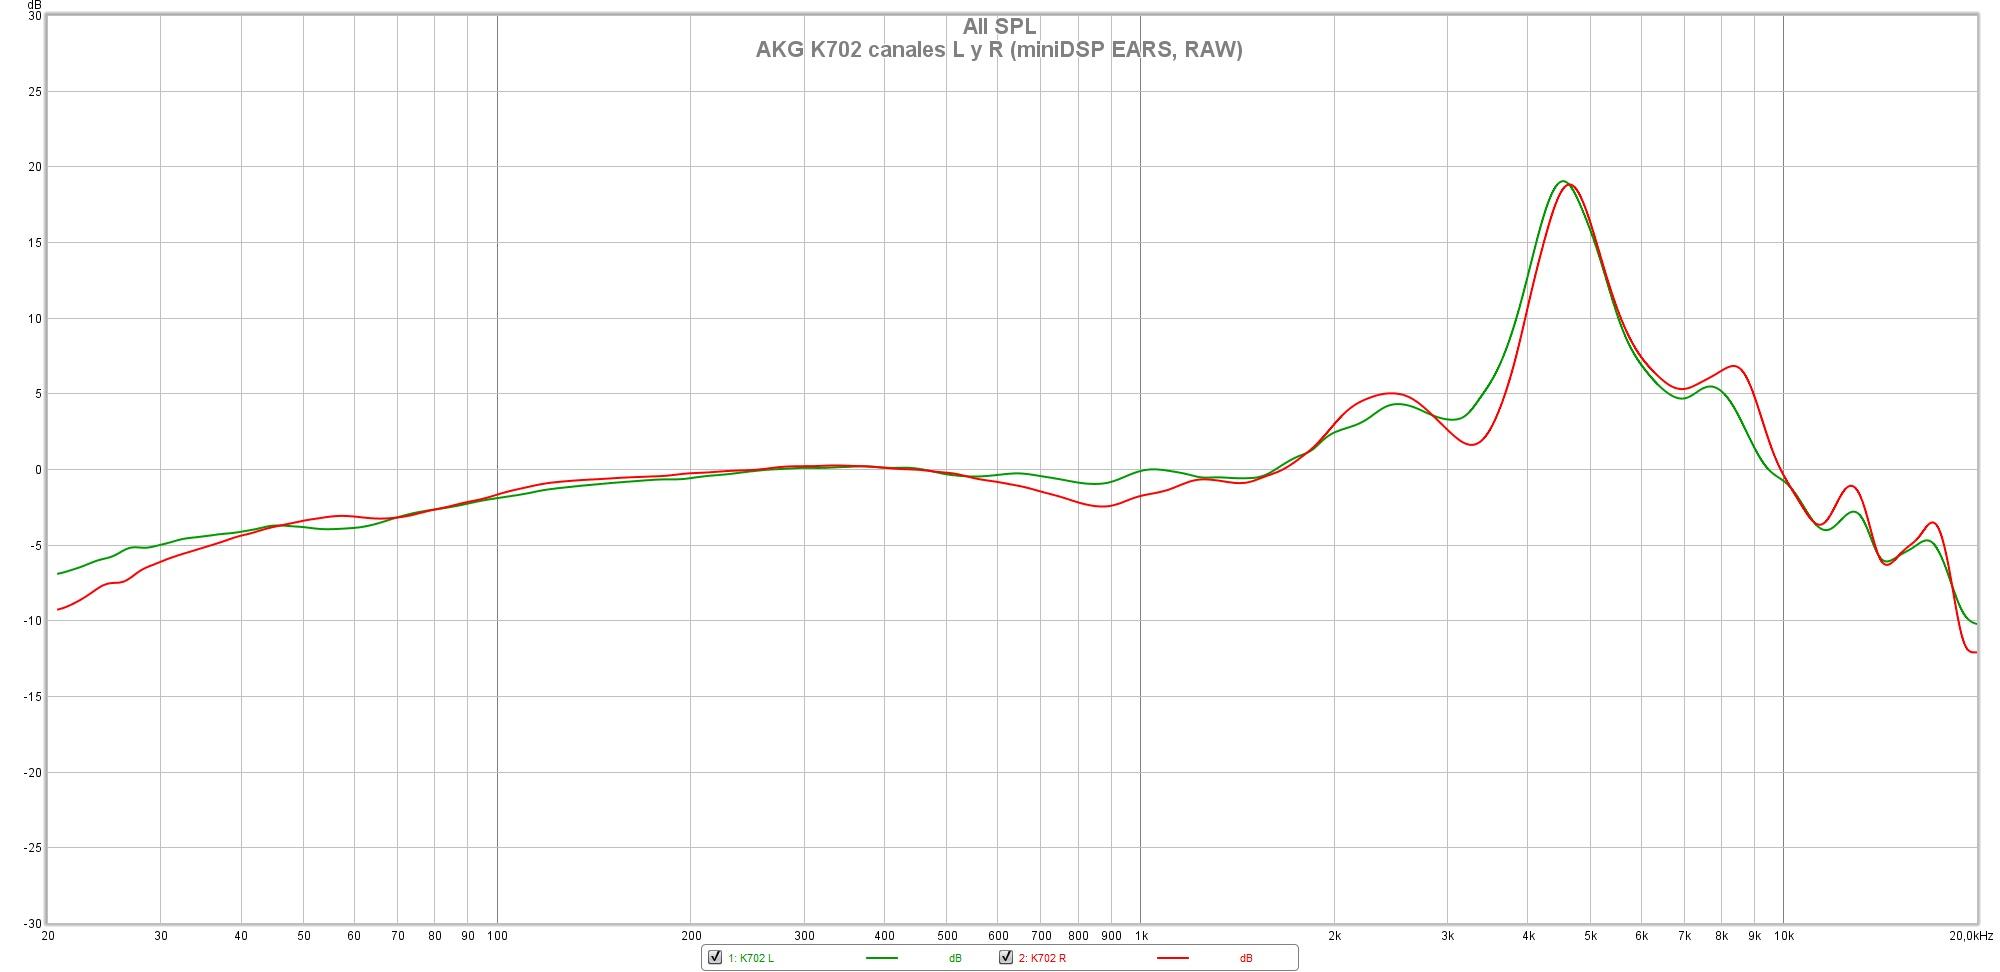 AKG K702 canales L y R (miniDSP EARS, RAW) 1